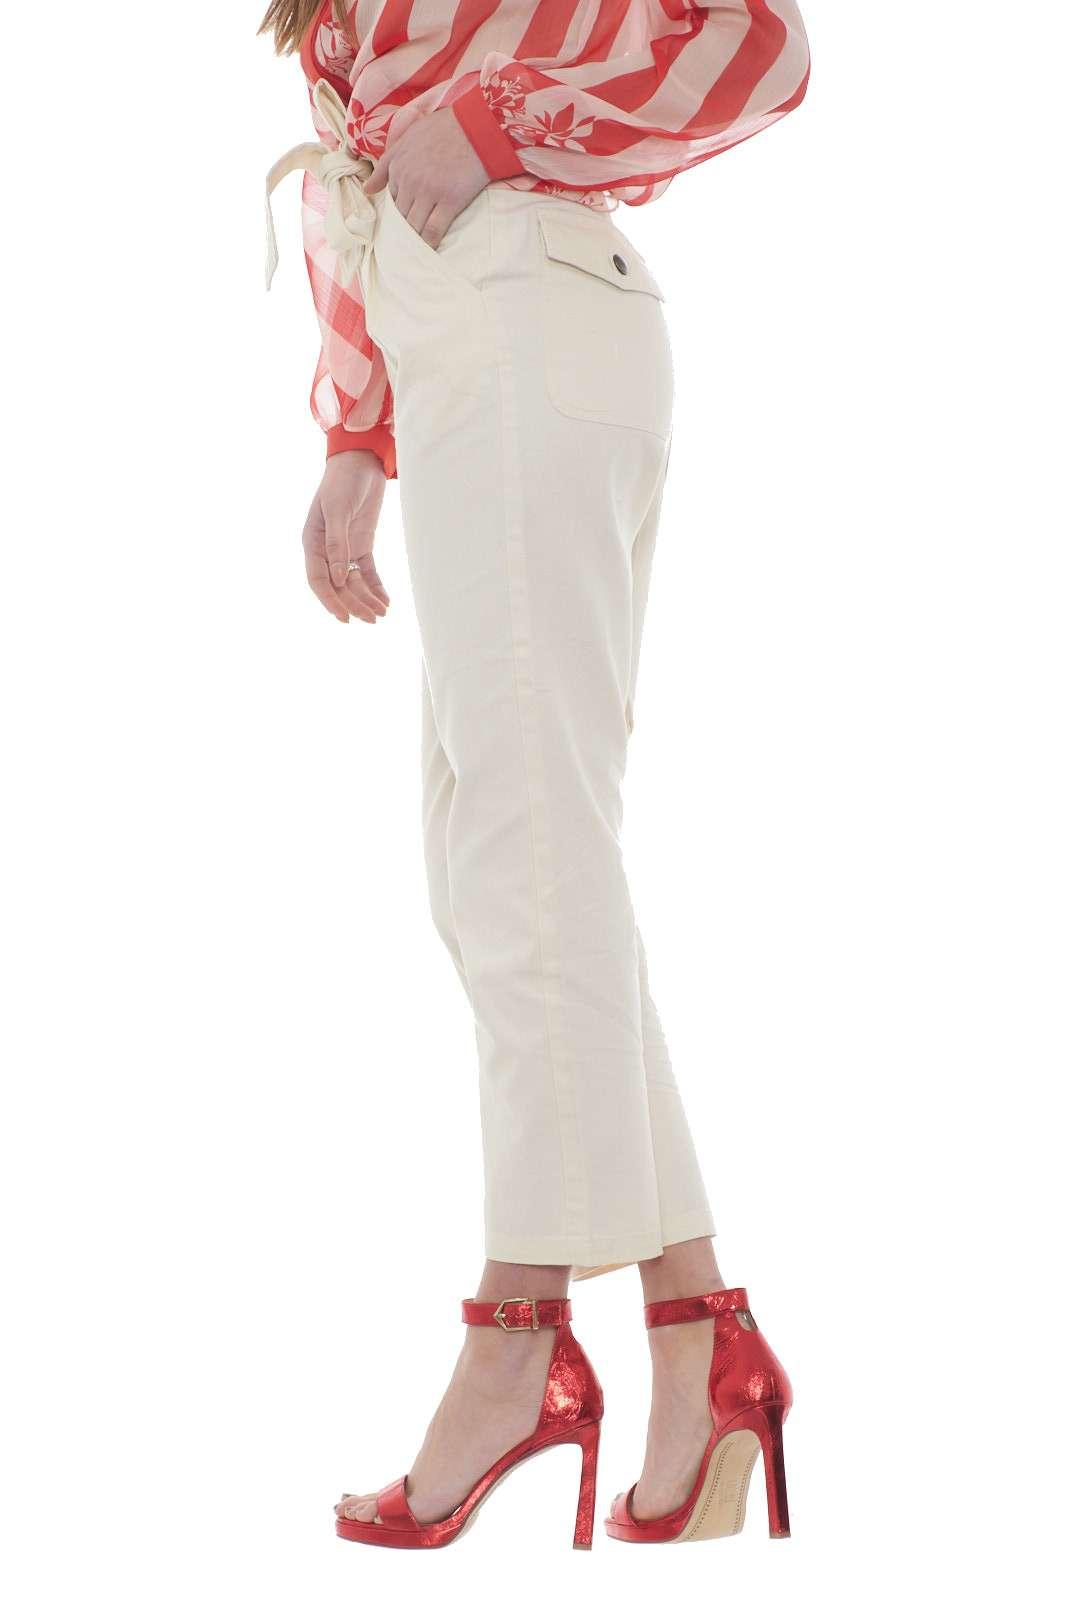 https://www.parmax.com/media/catalog/product/a/i/PE-outlet_parmax-pantaloni-donna-TwinSet-201TP2015-B.jpg